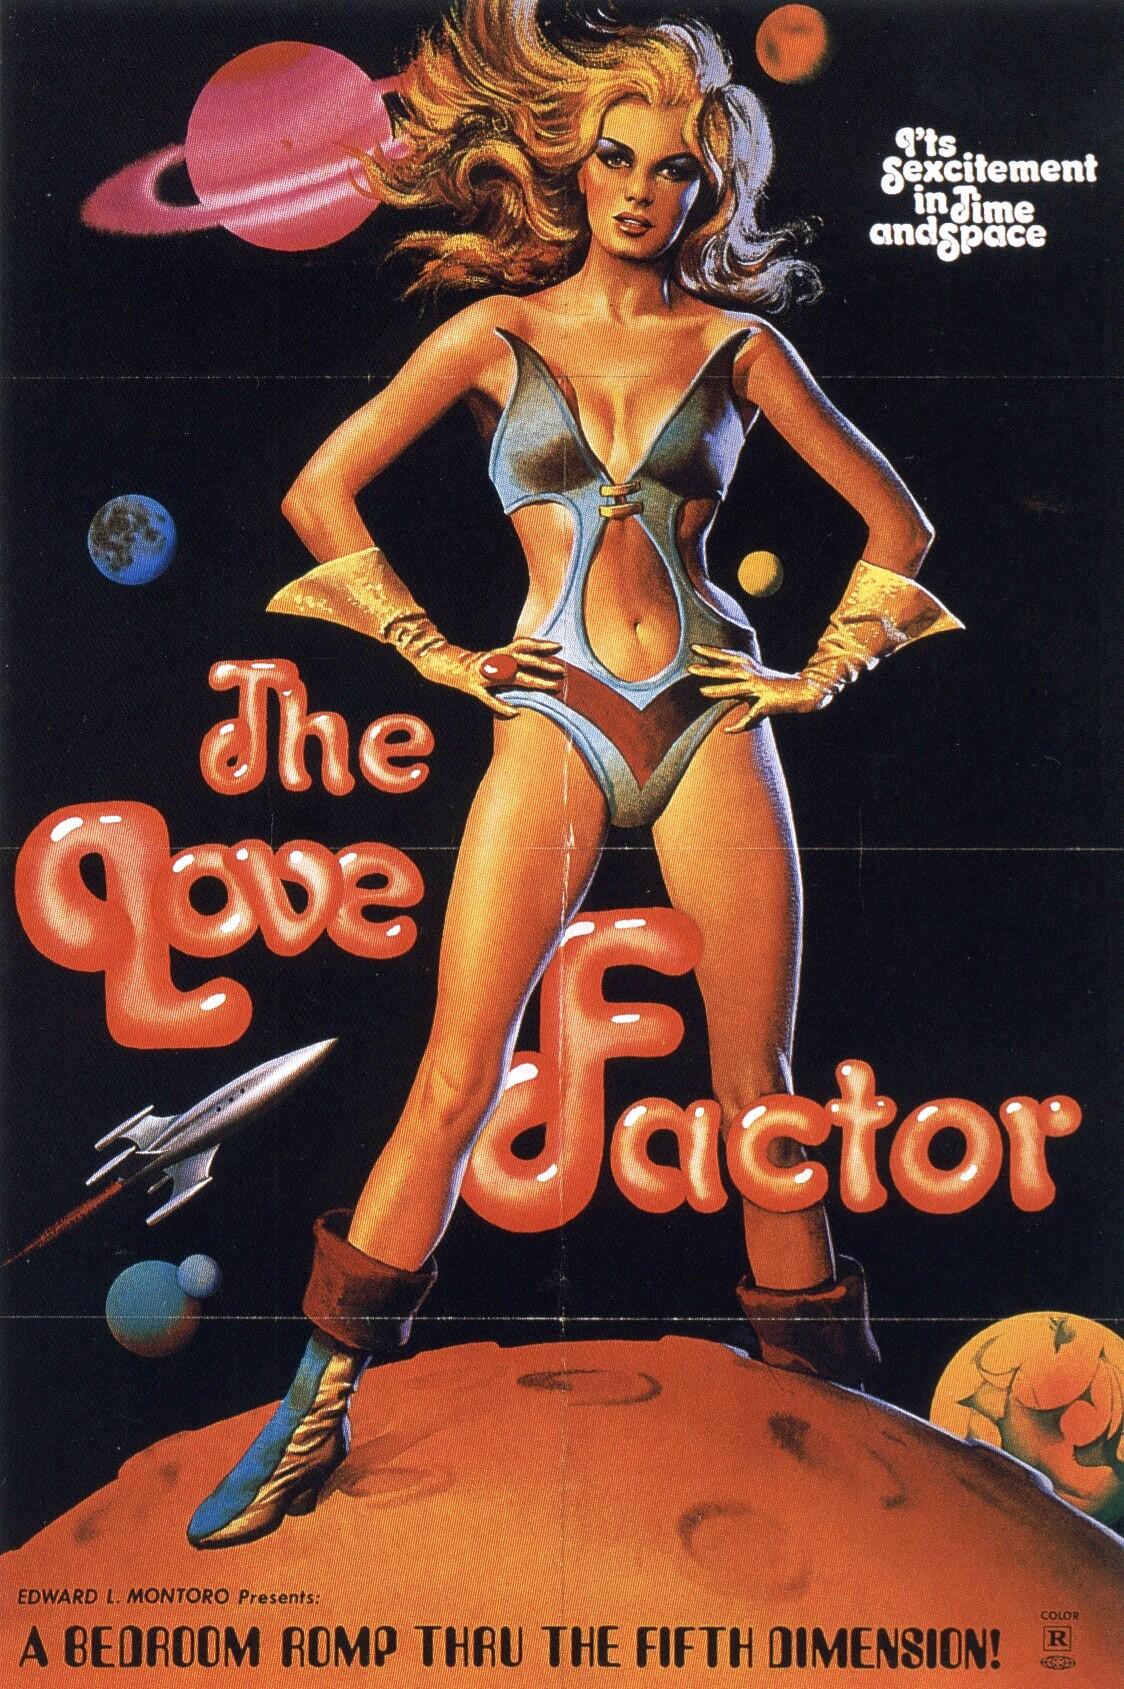 http://lh6.ggpht.com/_IGcPoXkEPio/R_xsBmsbMKI/AAAAAAAAEWU/oh89WdYJx00/s0/love_factor_1969_poster_01.jpg